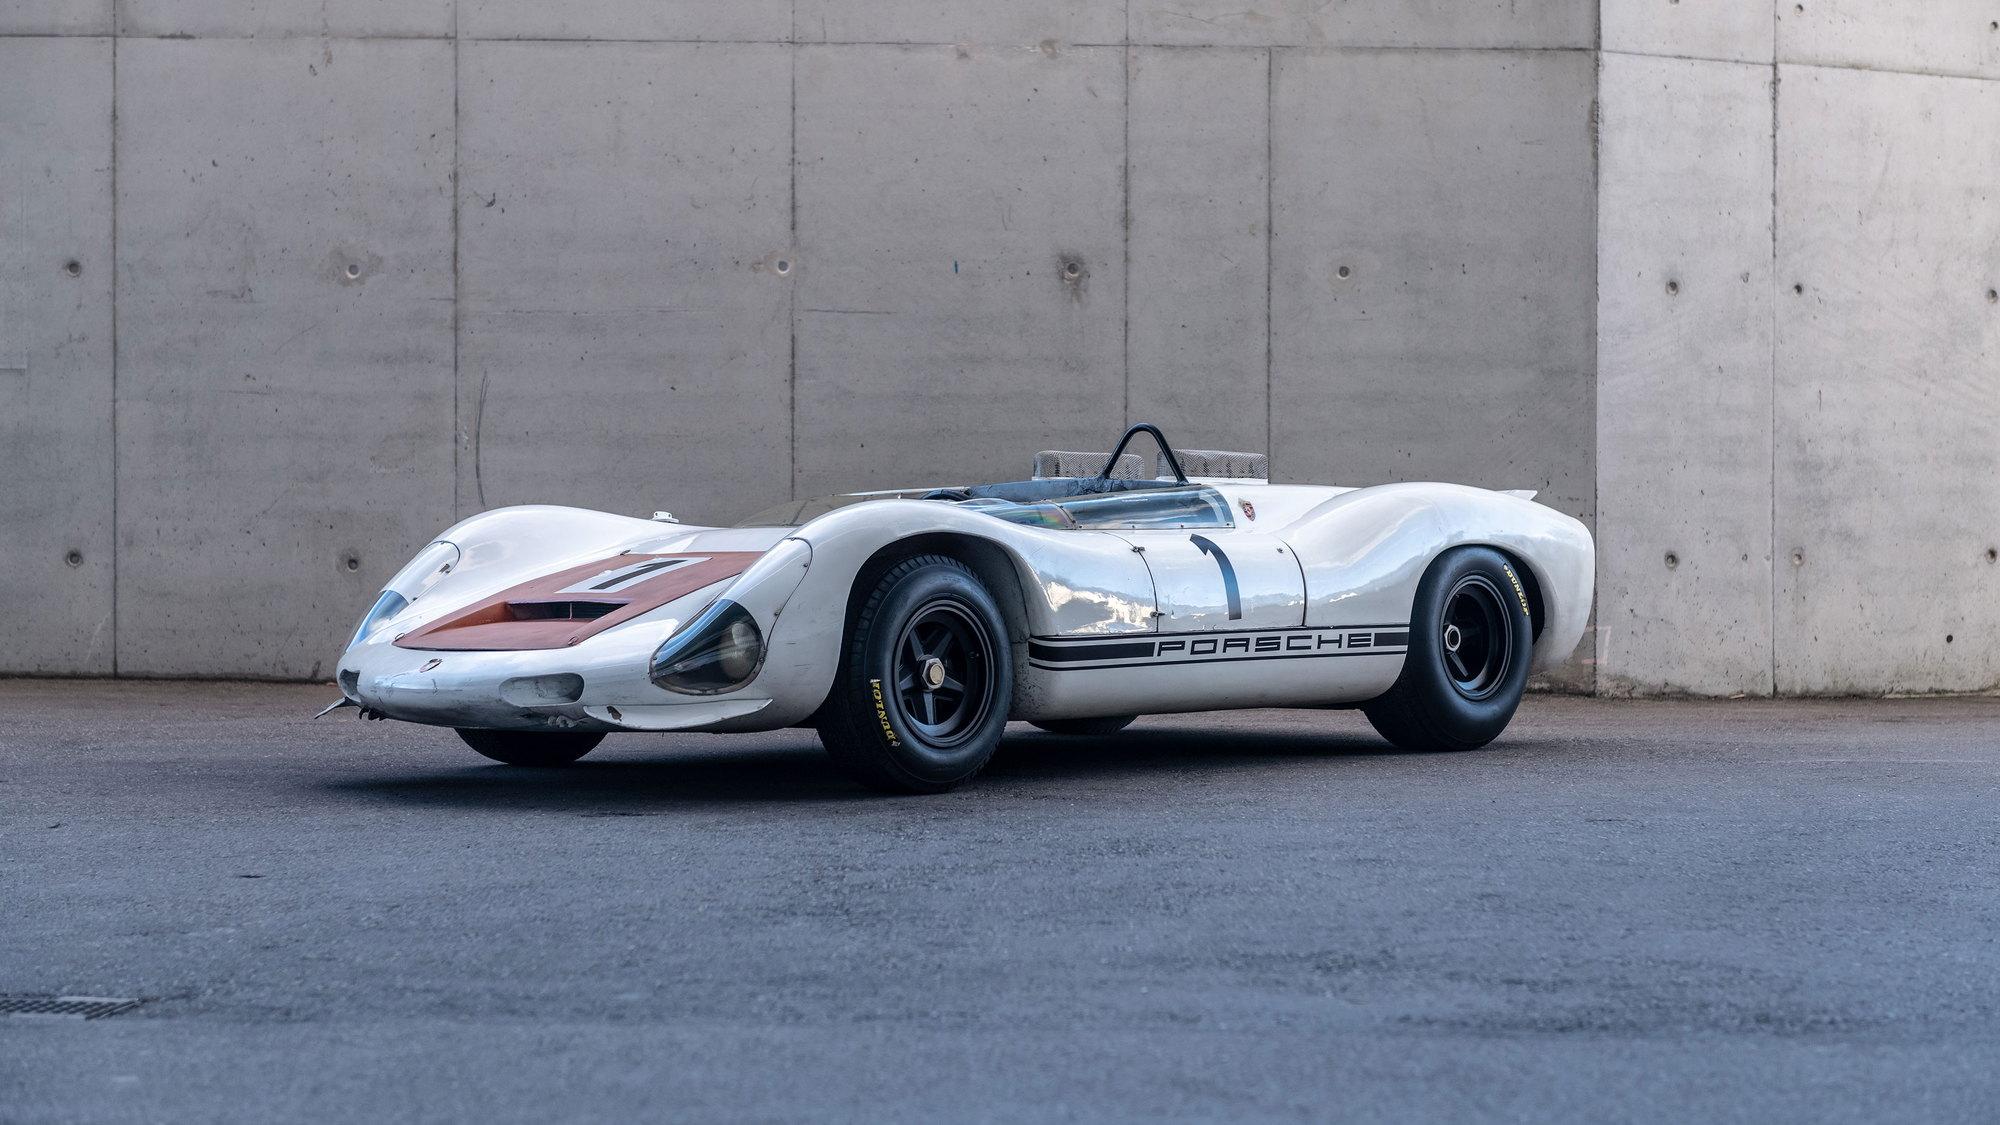 1967 910/8 Bergspyder preserved at Porsche Museum